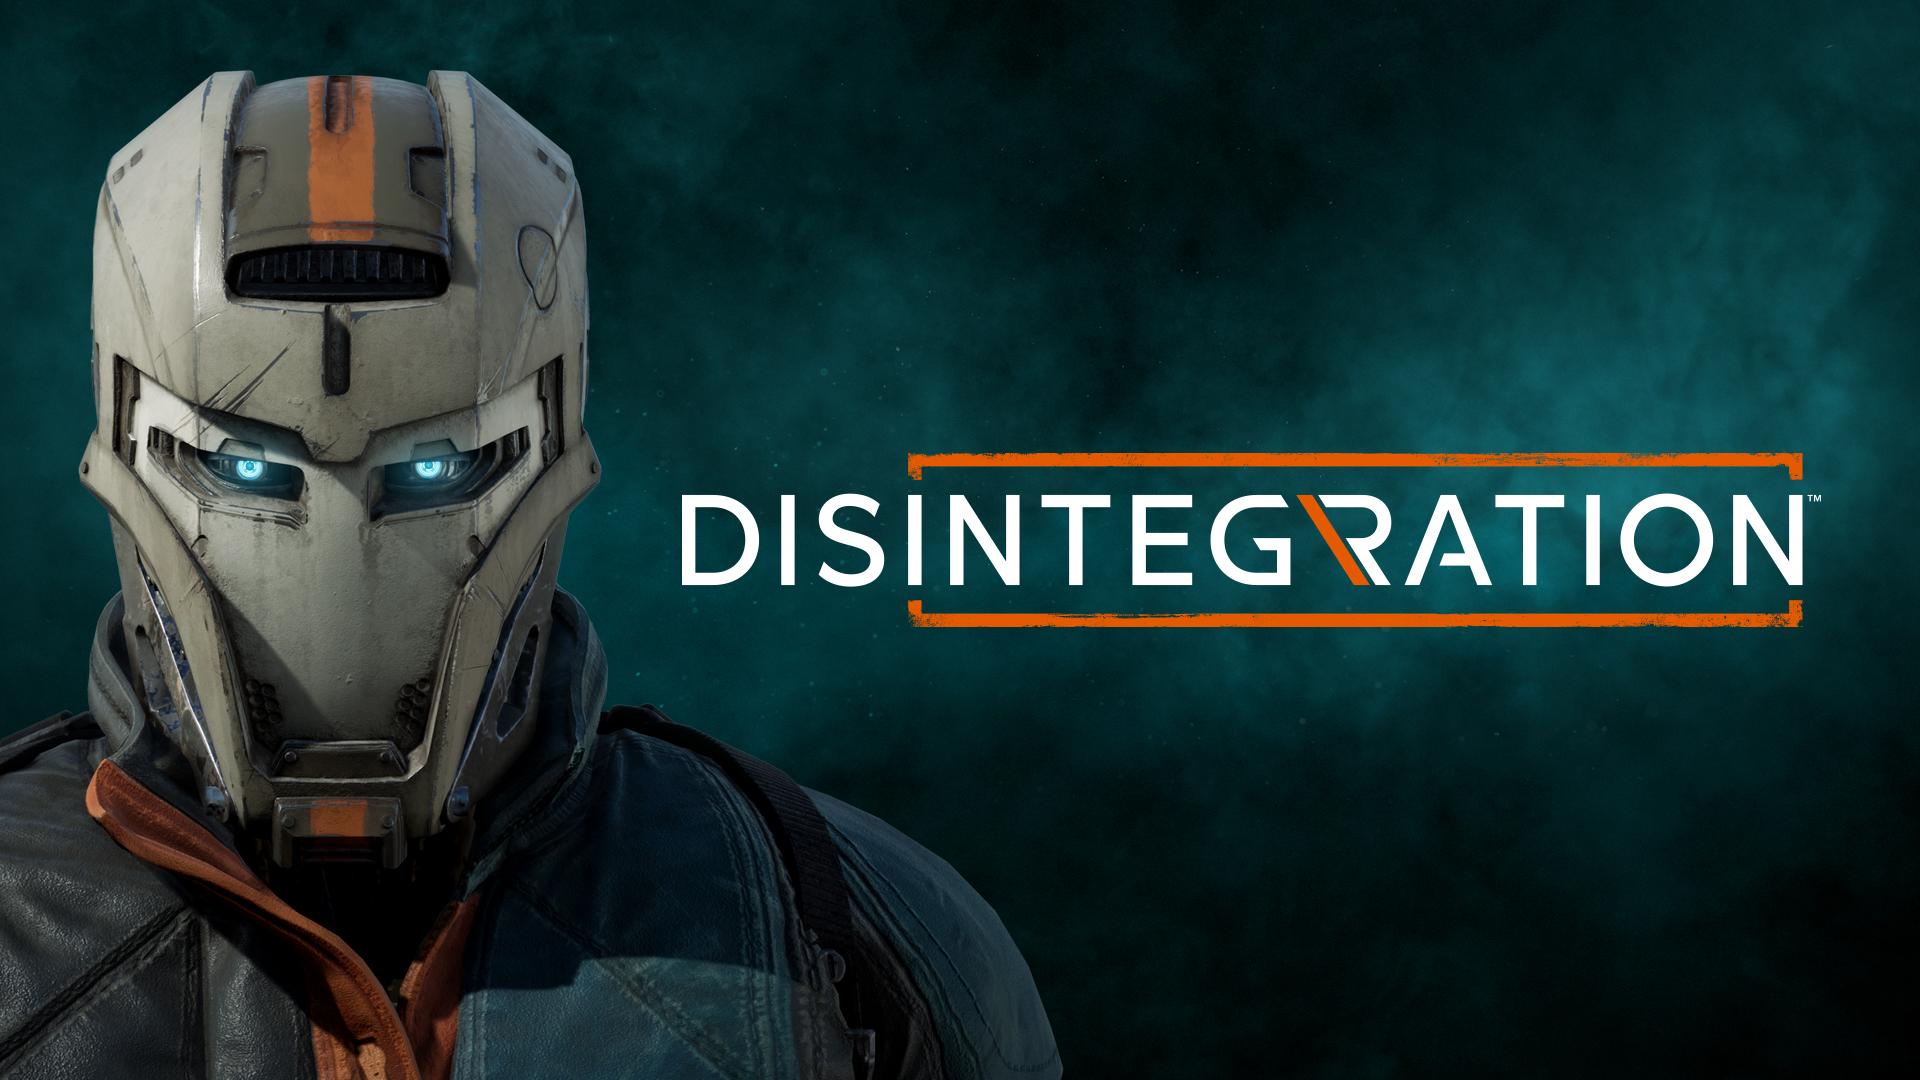 Disintegration Beta provato: le nostre prime impressioni thumbnail